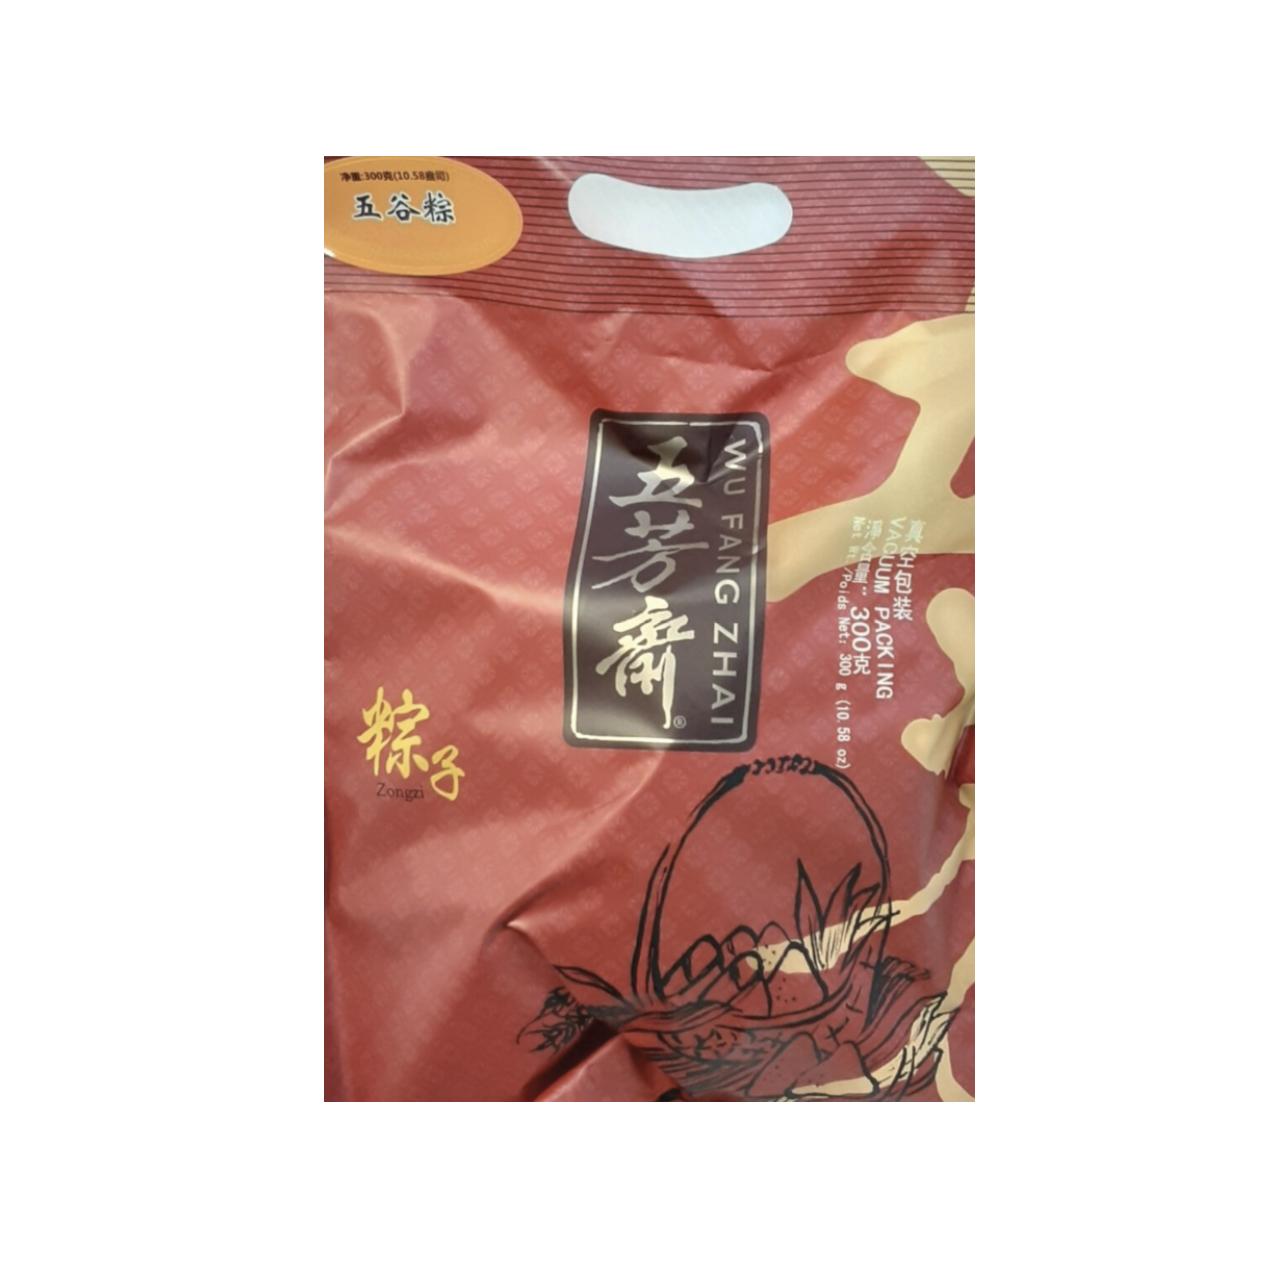 五芳斋 五谷粽 ~300g(10.58oz) WU FANG ZHAI ZONGZI (COOKED GLUTINOUS RICE DUMPLING) 300g(10.58oz)